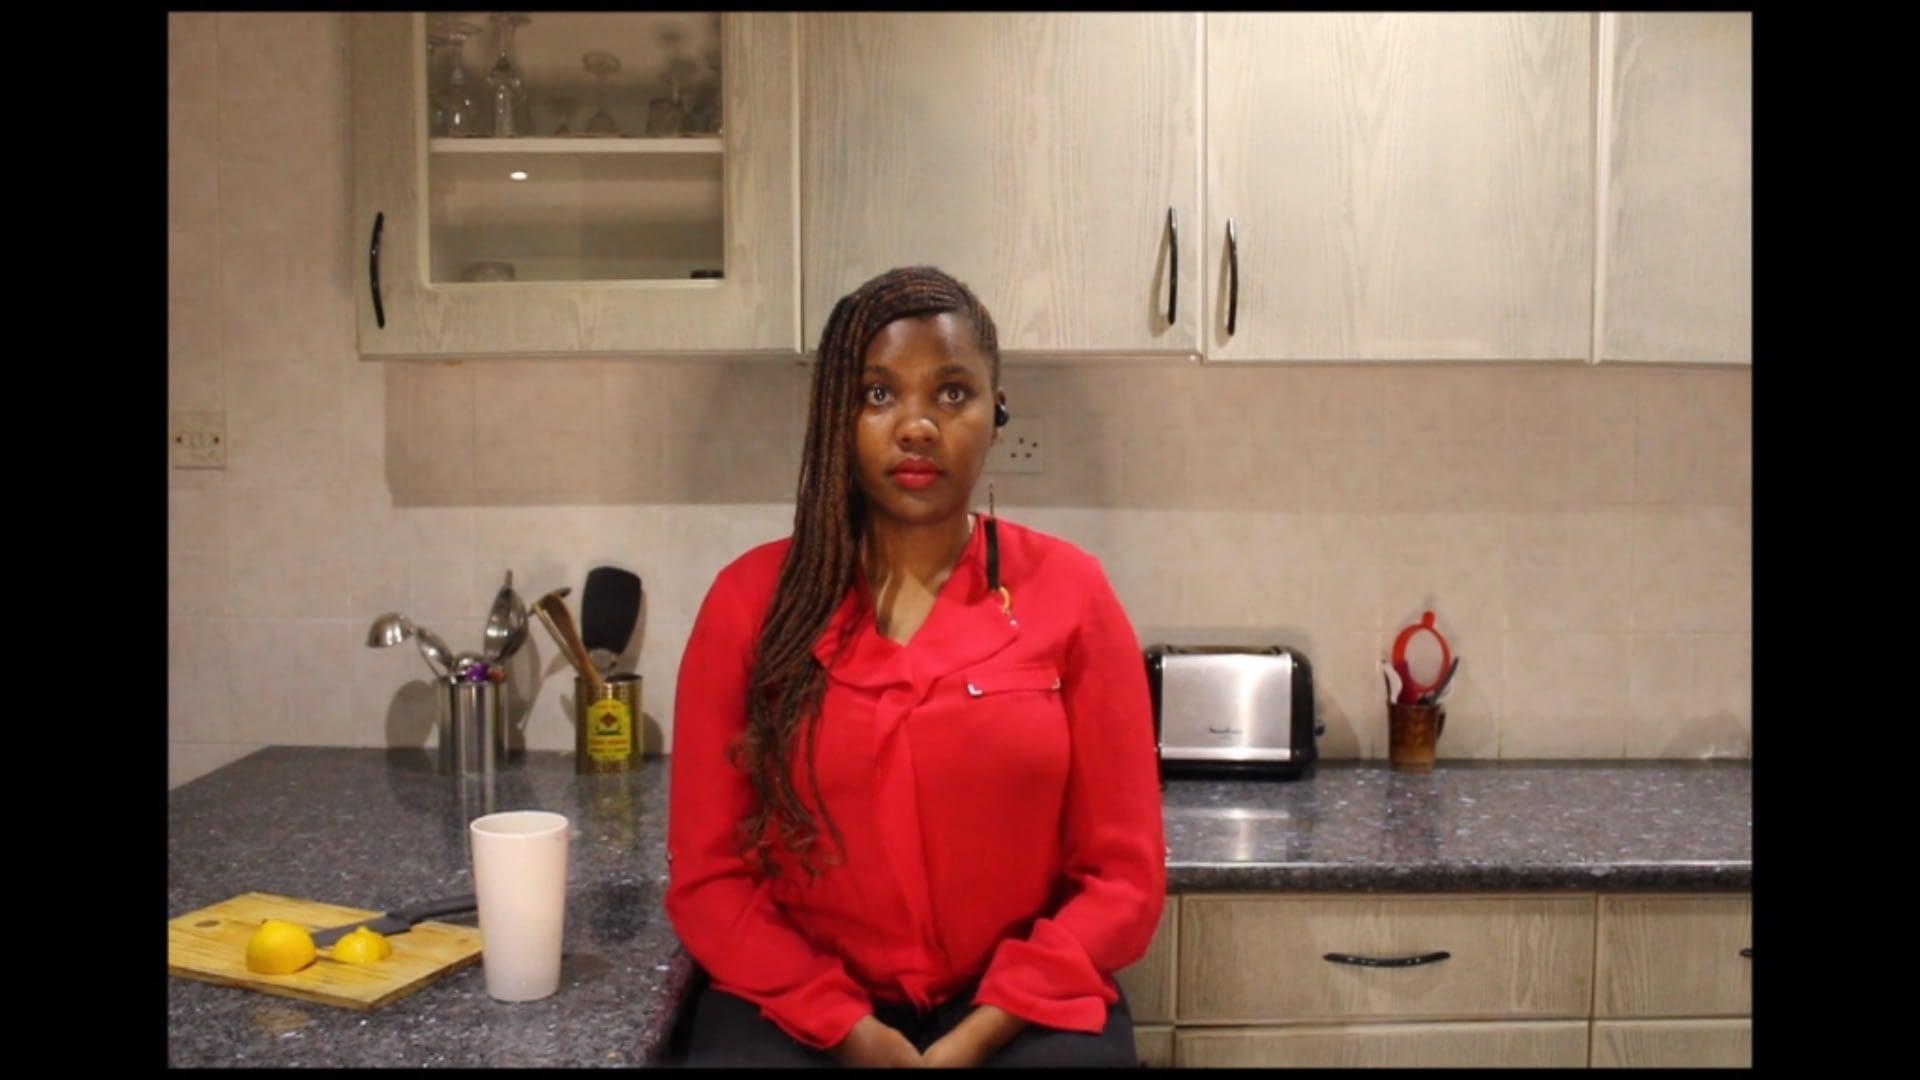 Anne Moraa in Cucu directed by Kholoud Sawaf/SRĐA and Nyokabi Macharia as part Theatre for One